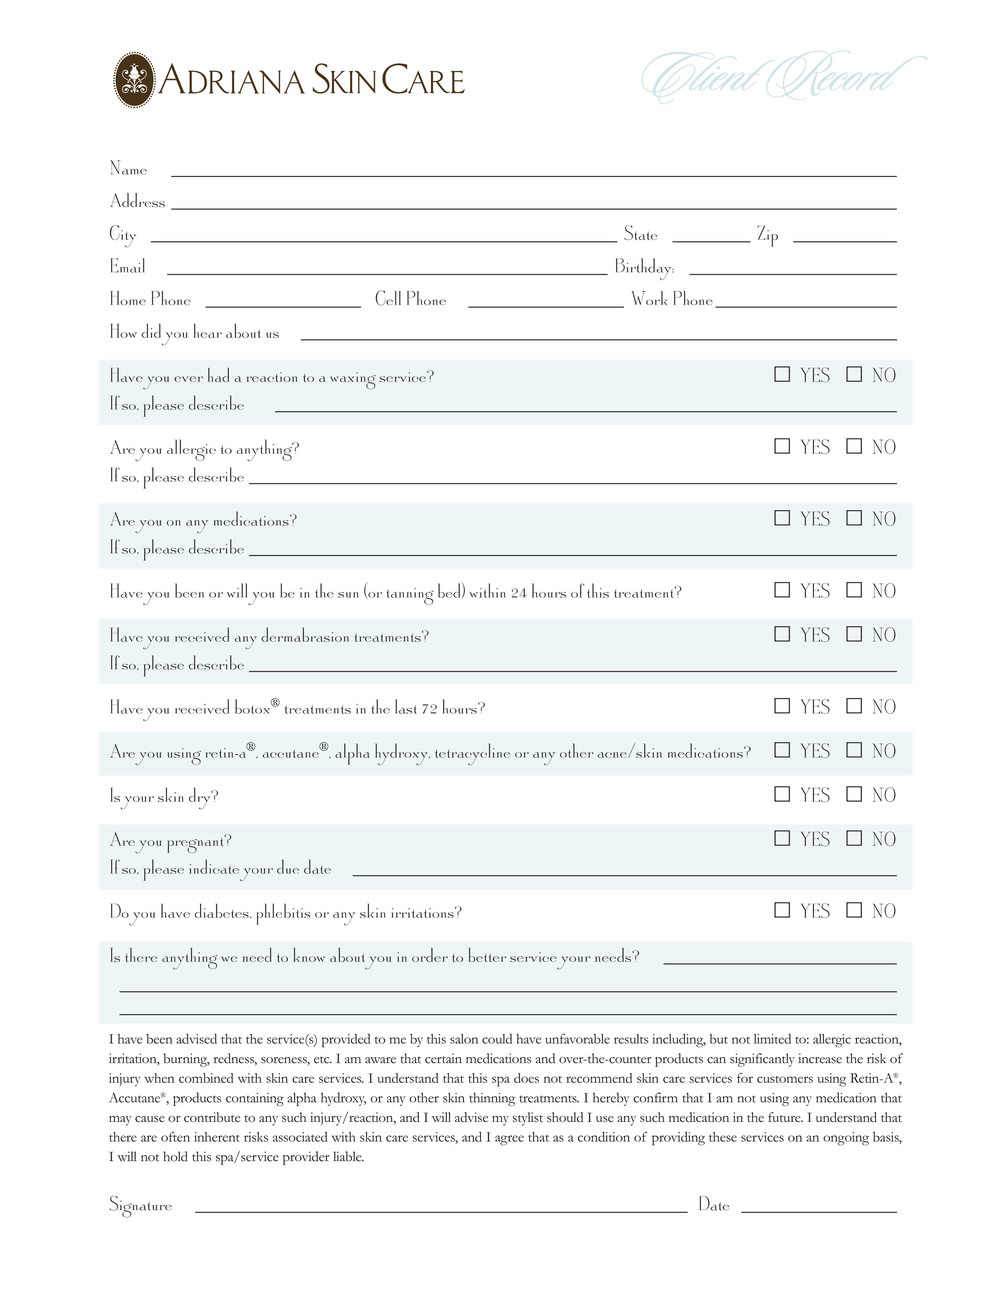 ASC Client Form.jpg